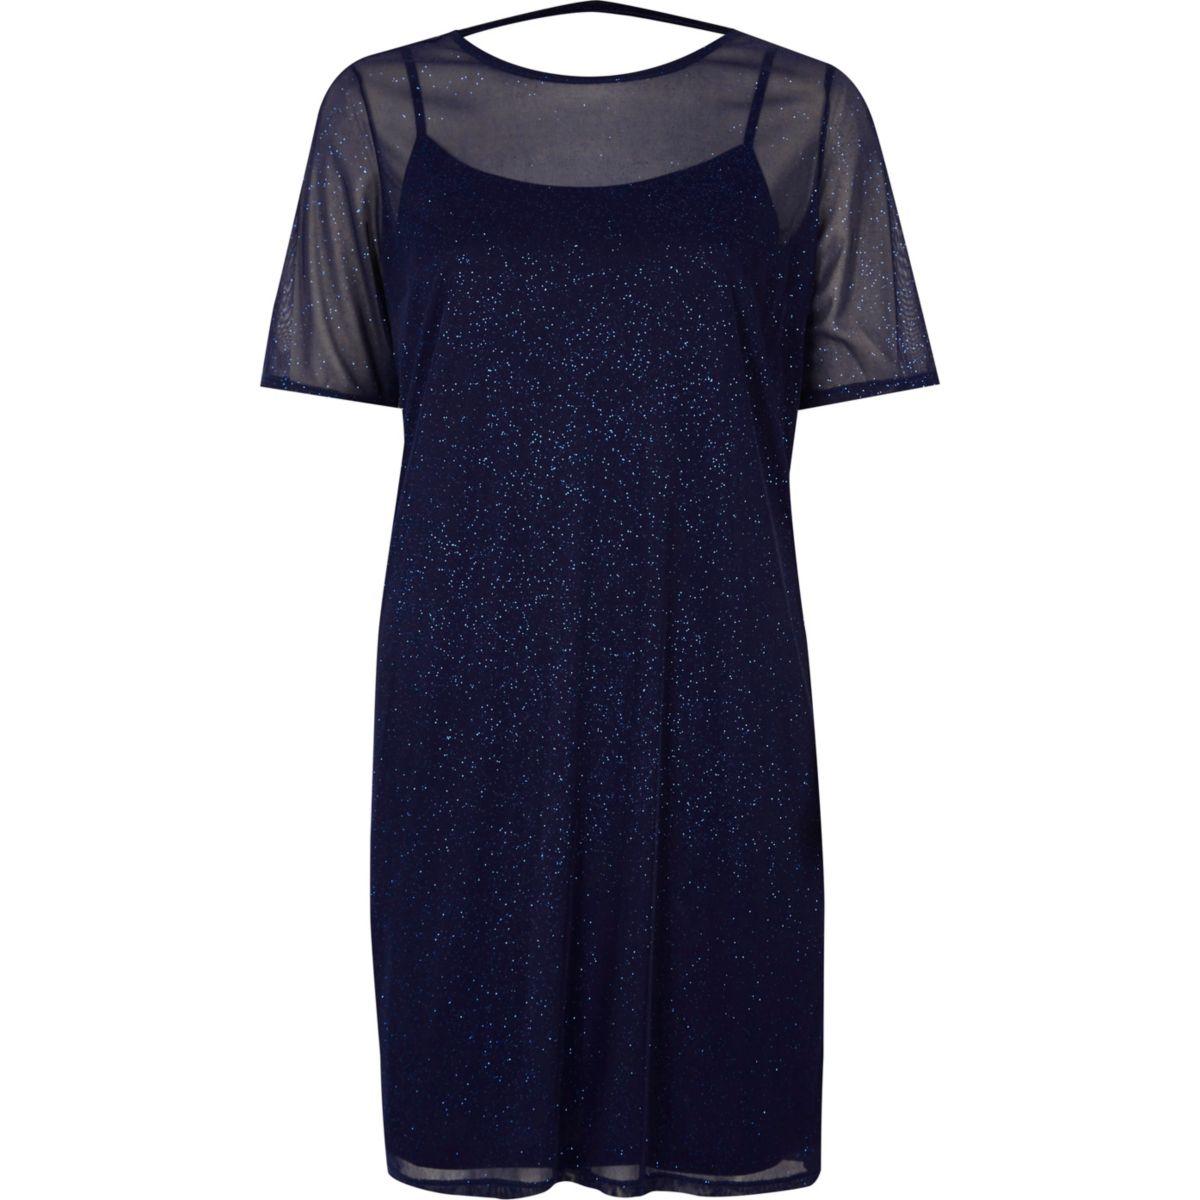 Dark blue glitter mesh t shirt dress dresses sale women for Dress shirts on sale online